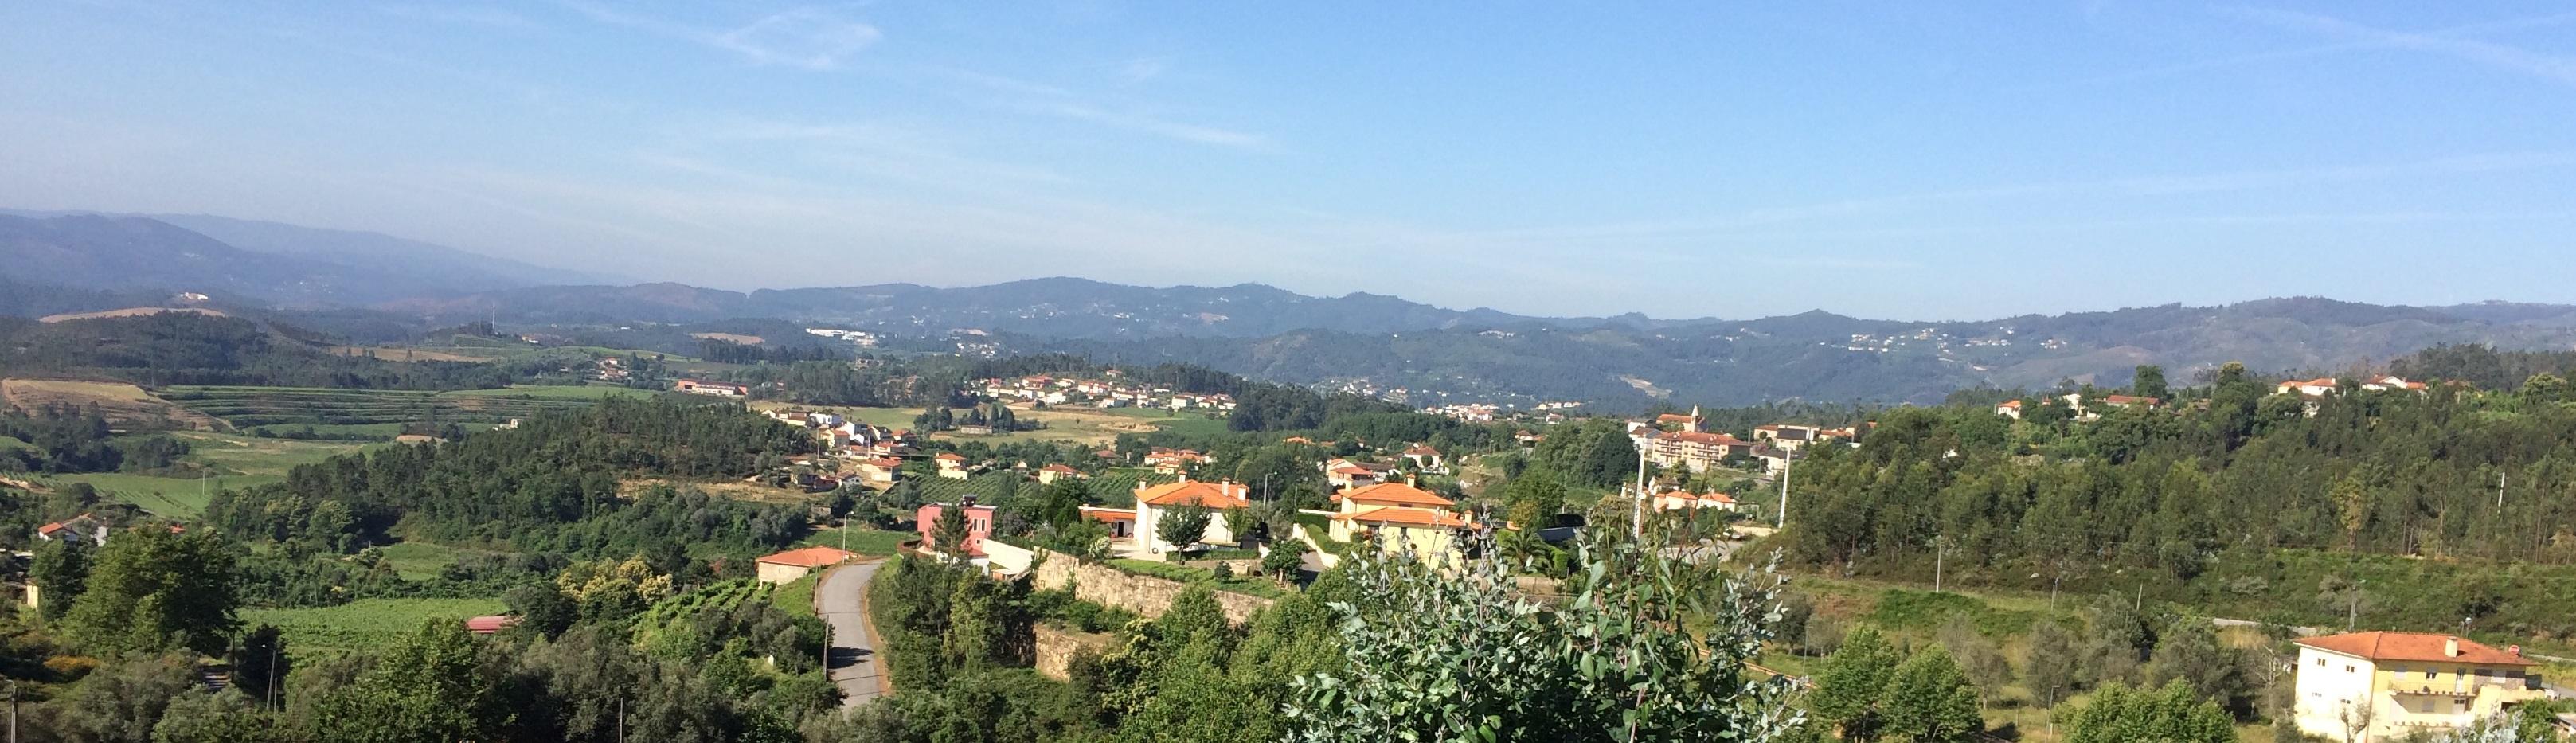 Wat vinden toekomstige kopers van het Easy Living Portugal